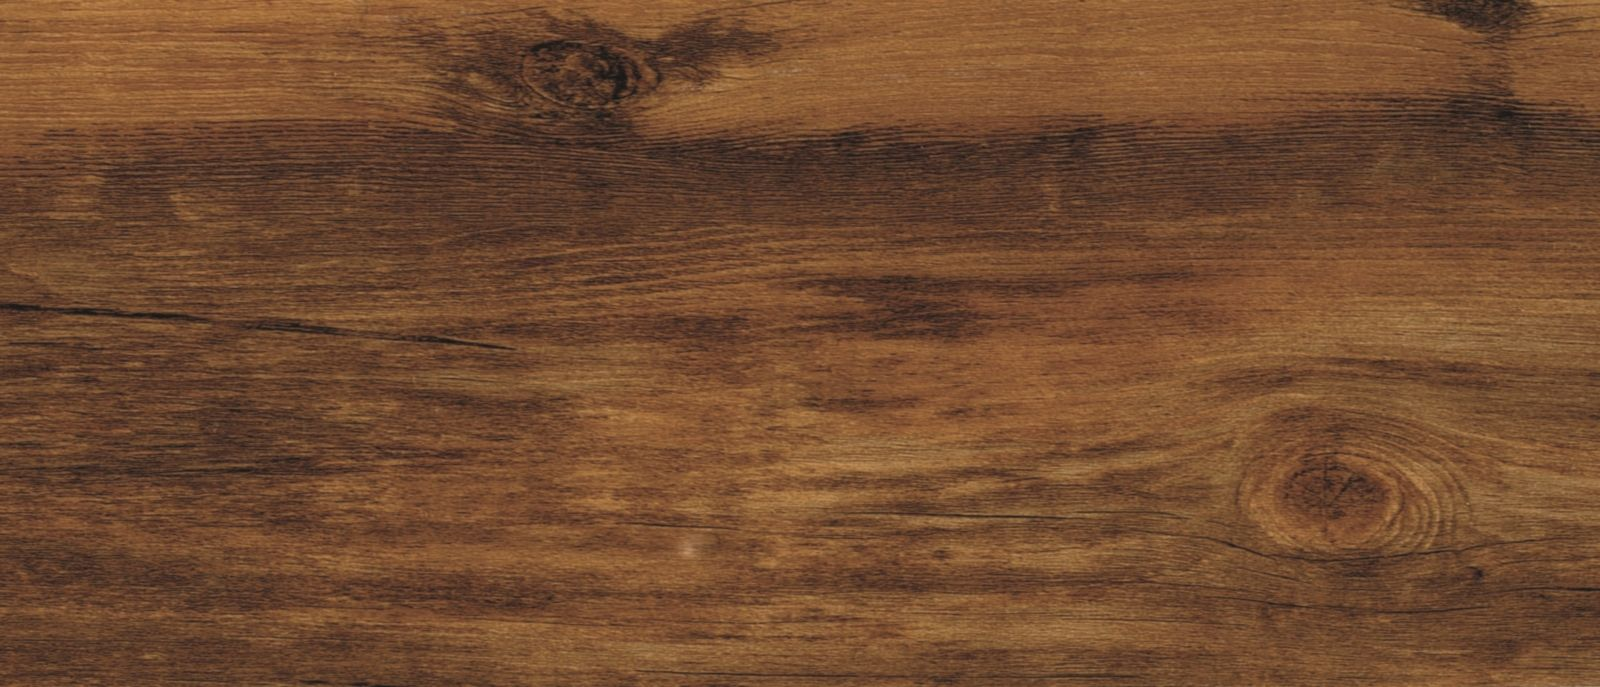 Handscraped Sawmill Pine 85017 Wood Hardwood Floors Hardwood